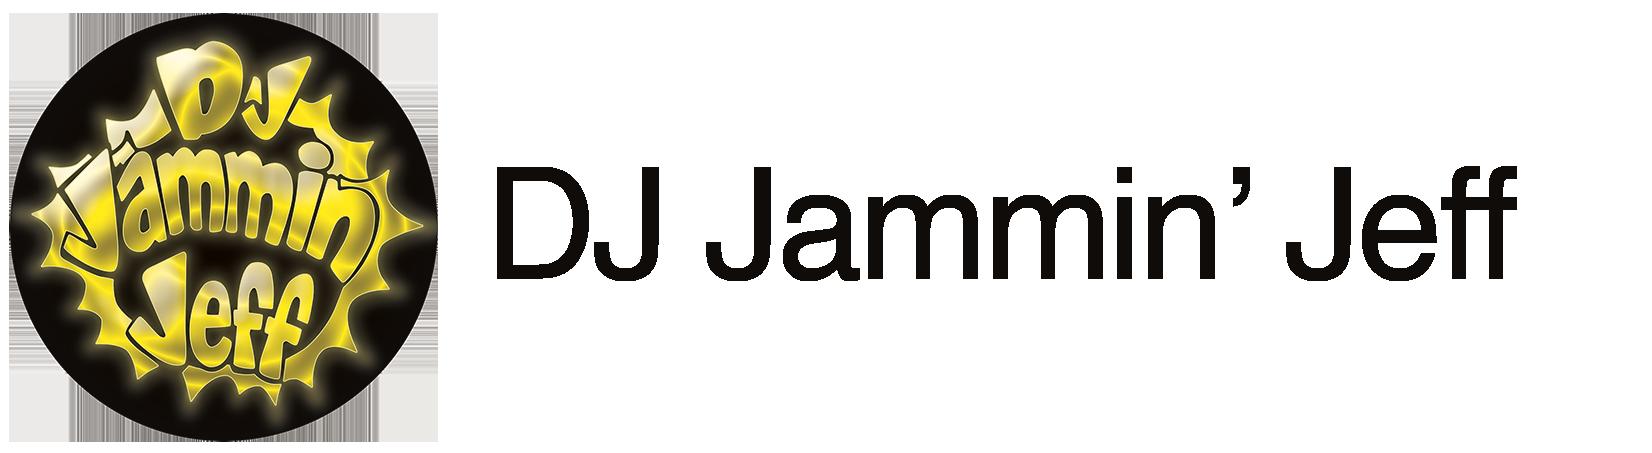 DJ Jammin Jeff